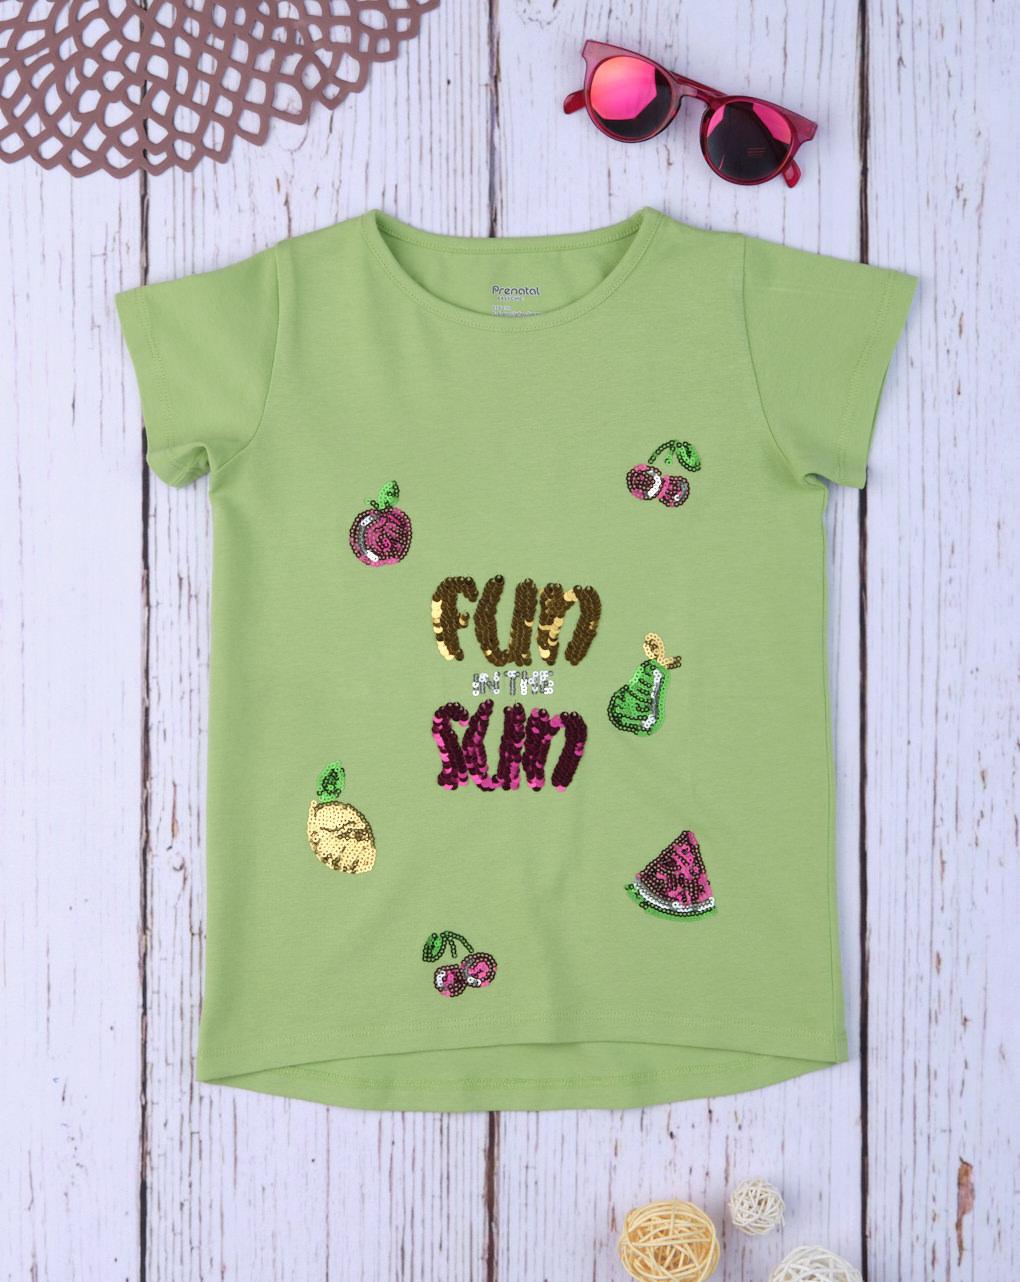 T-Shirt Jersey Ανοιχτό Πράσινο με Παγιέτες για Κορίτσι